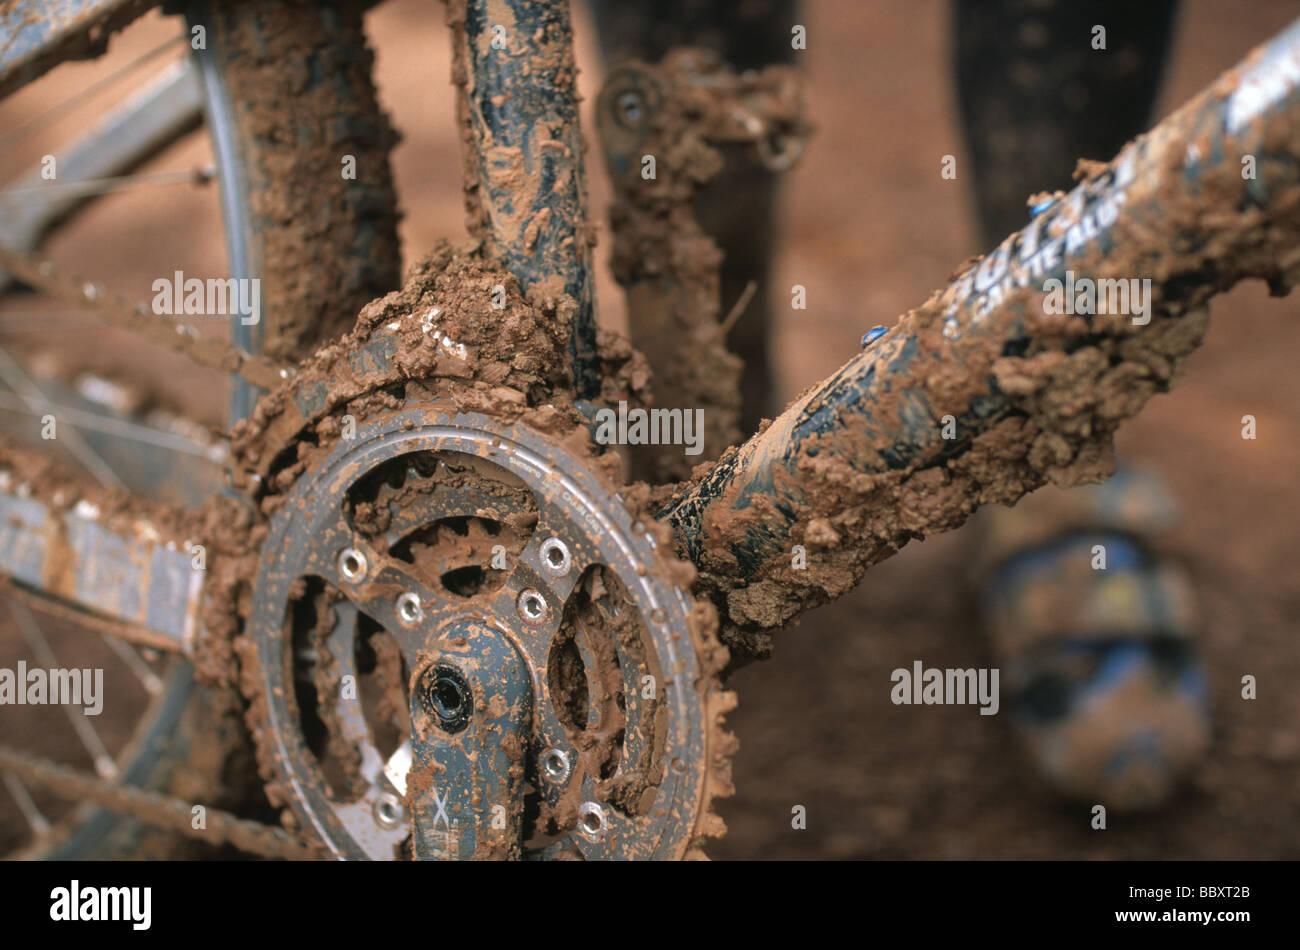 Muddy mountain bike - Stock Image